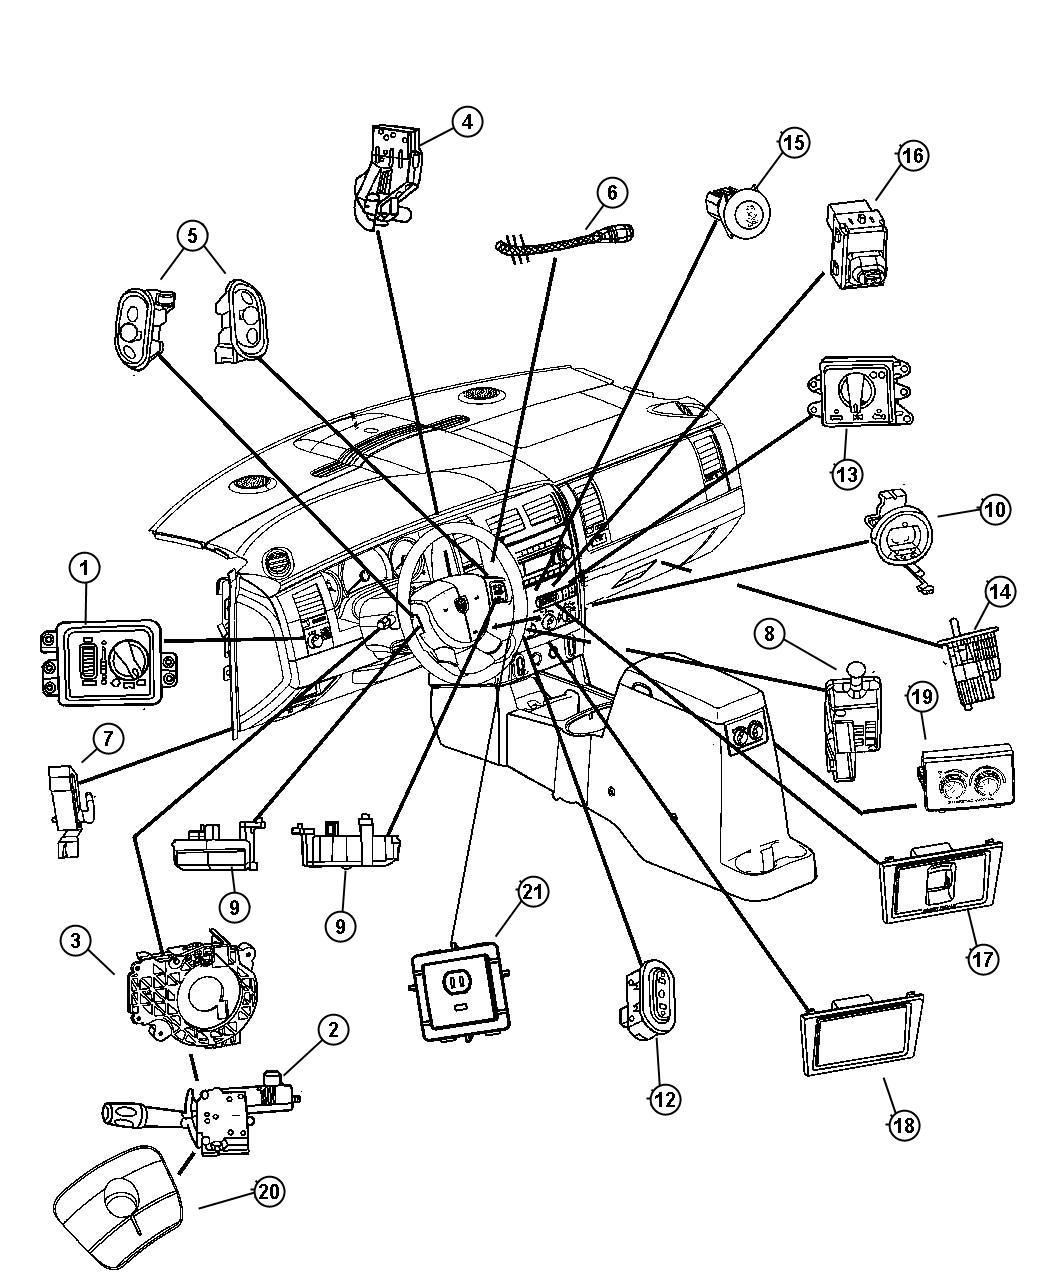 Dodge Durango Clkspring Program Electronic